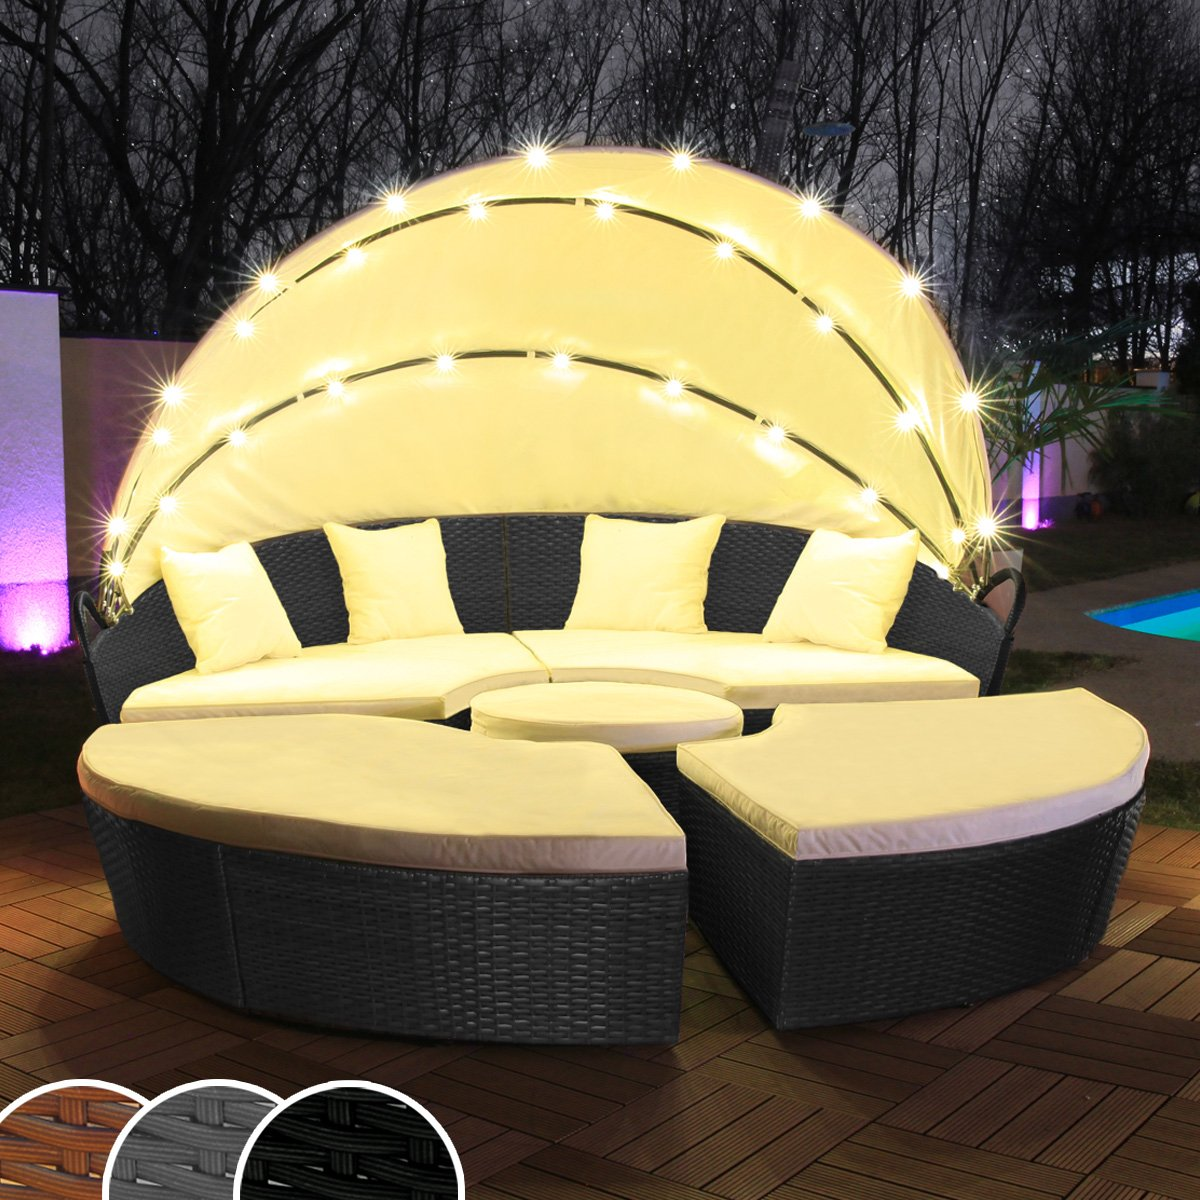 Swing & Harmonie Polyrattan Sonneninsel mit LED Beleuchtung Solarmodul inklusive Abdeckcover Rattan Lounge Sunbed Liege Insel mit Regencover